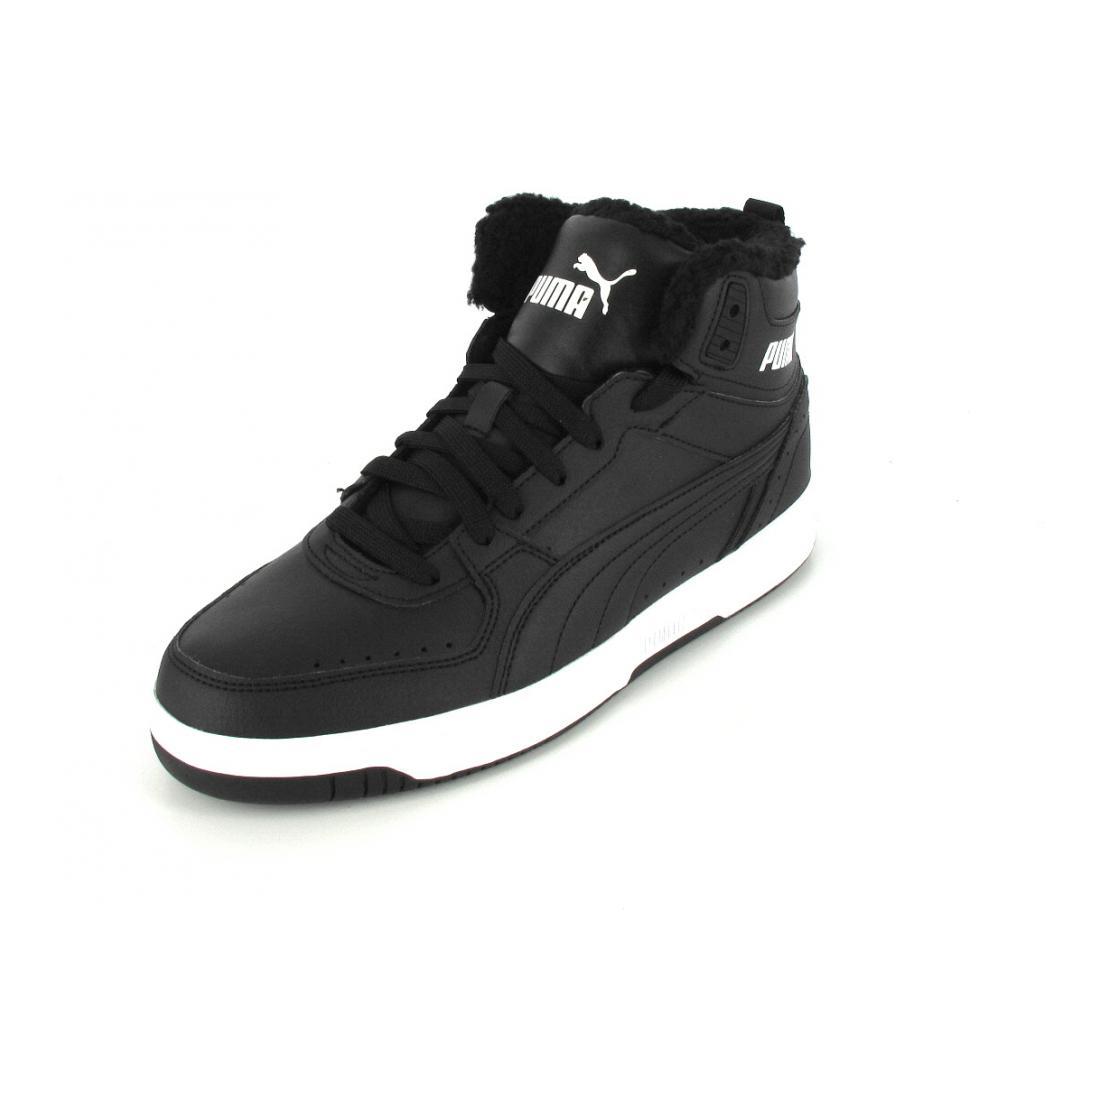 Puma Sneaker high Puma Rebound JOY Fur